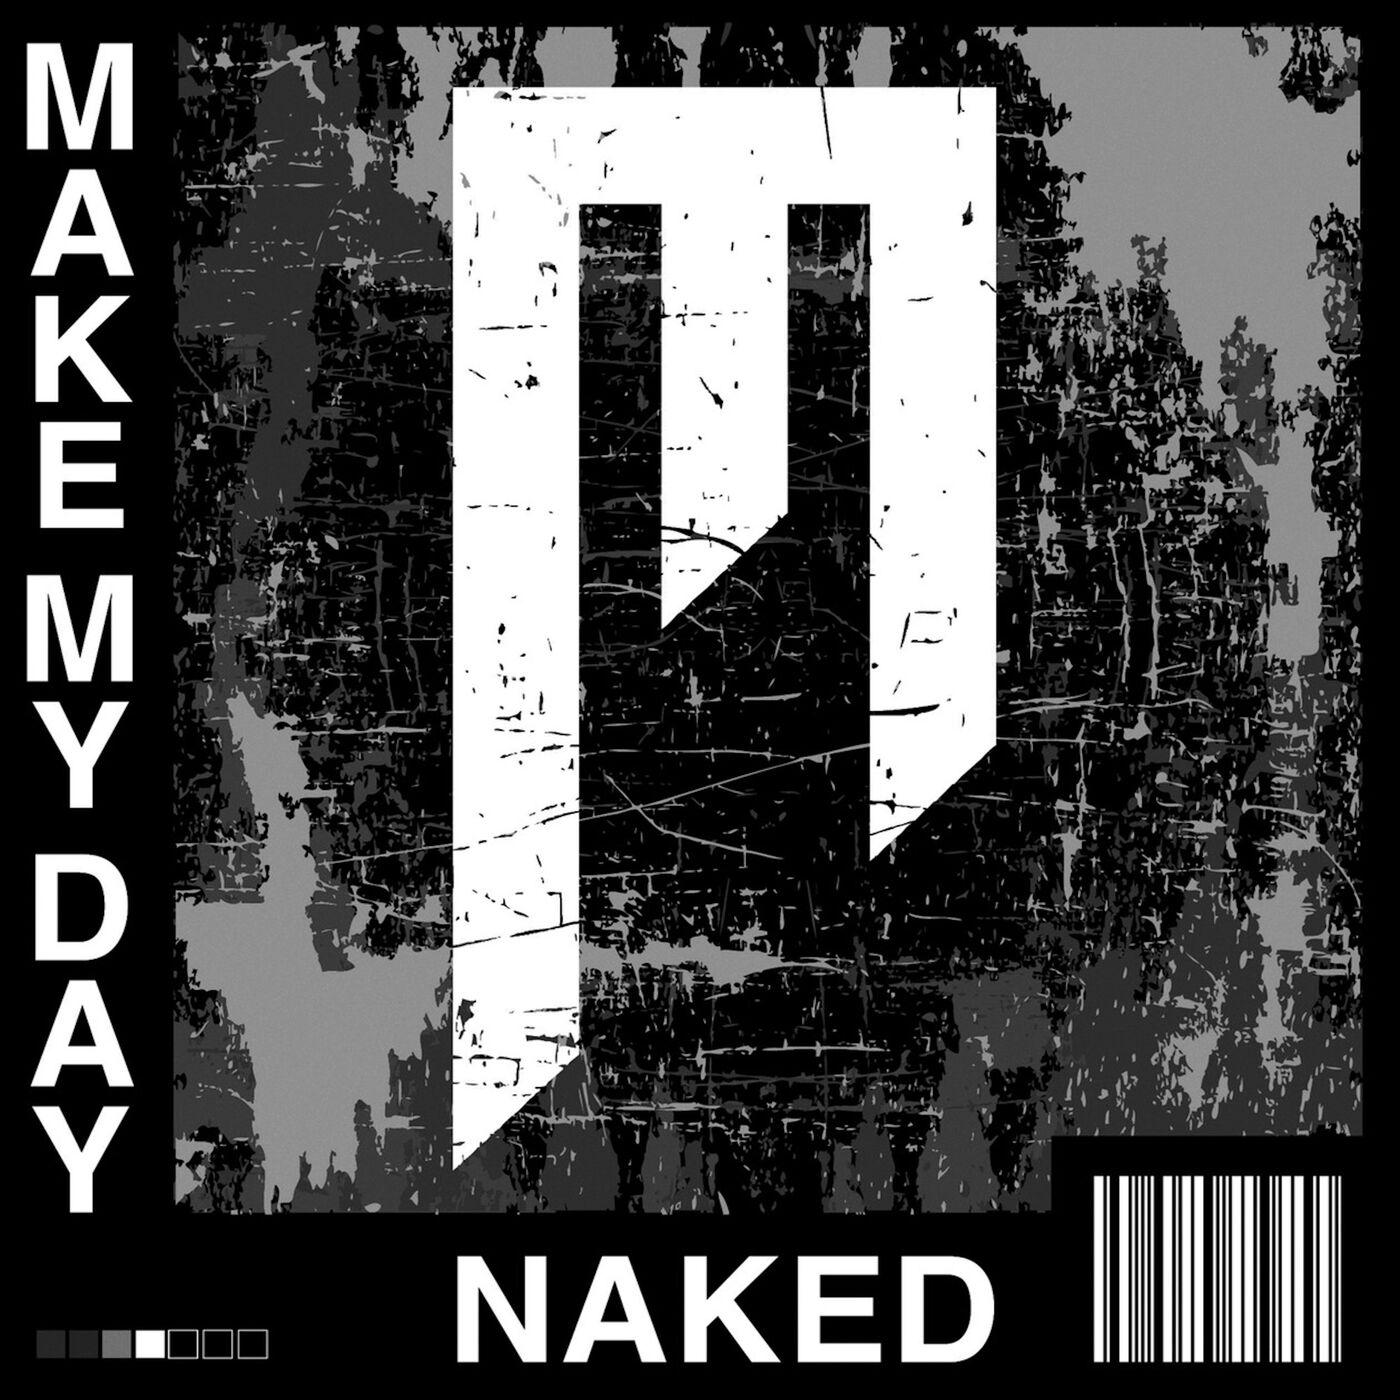 Make My Day - NAKED [EP] (2020)